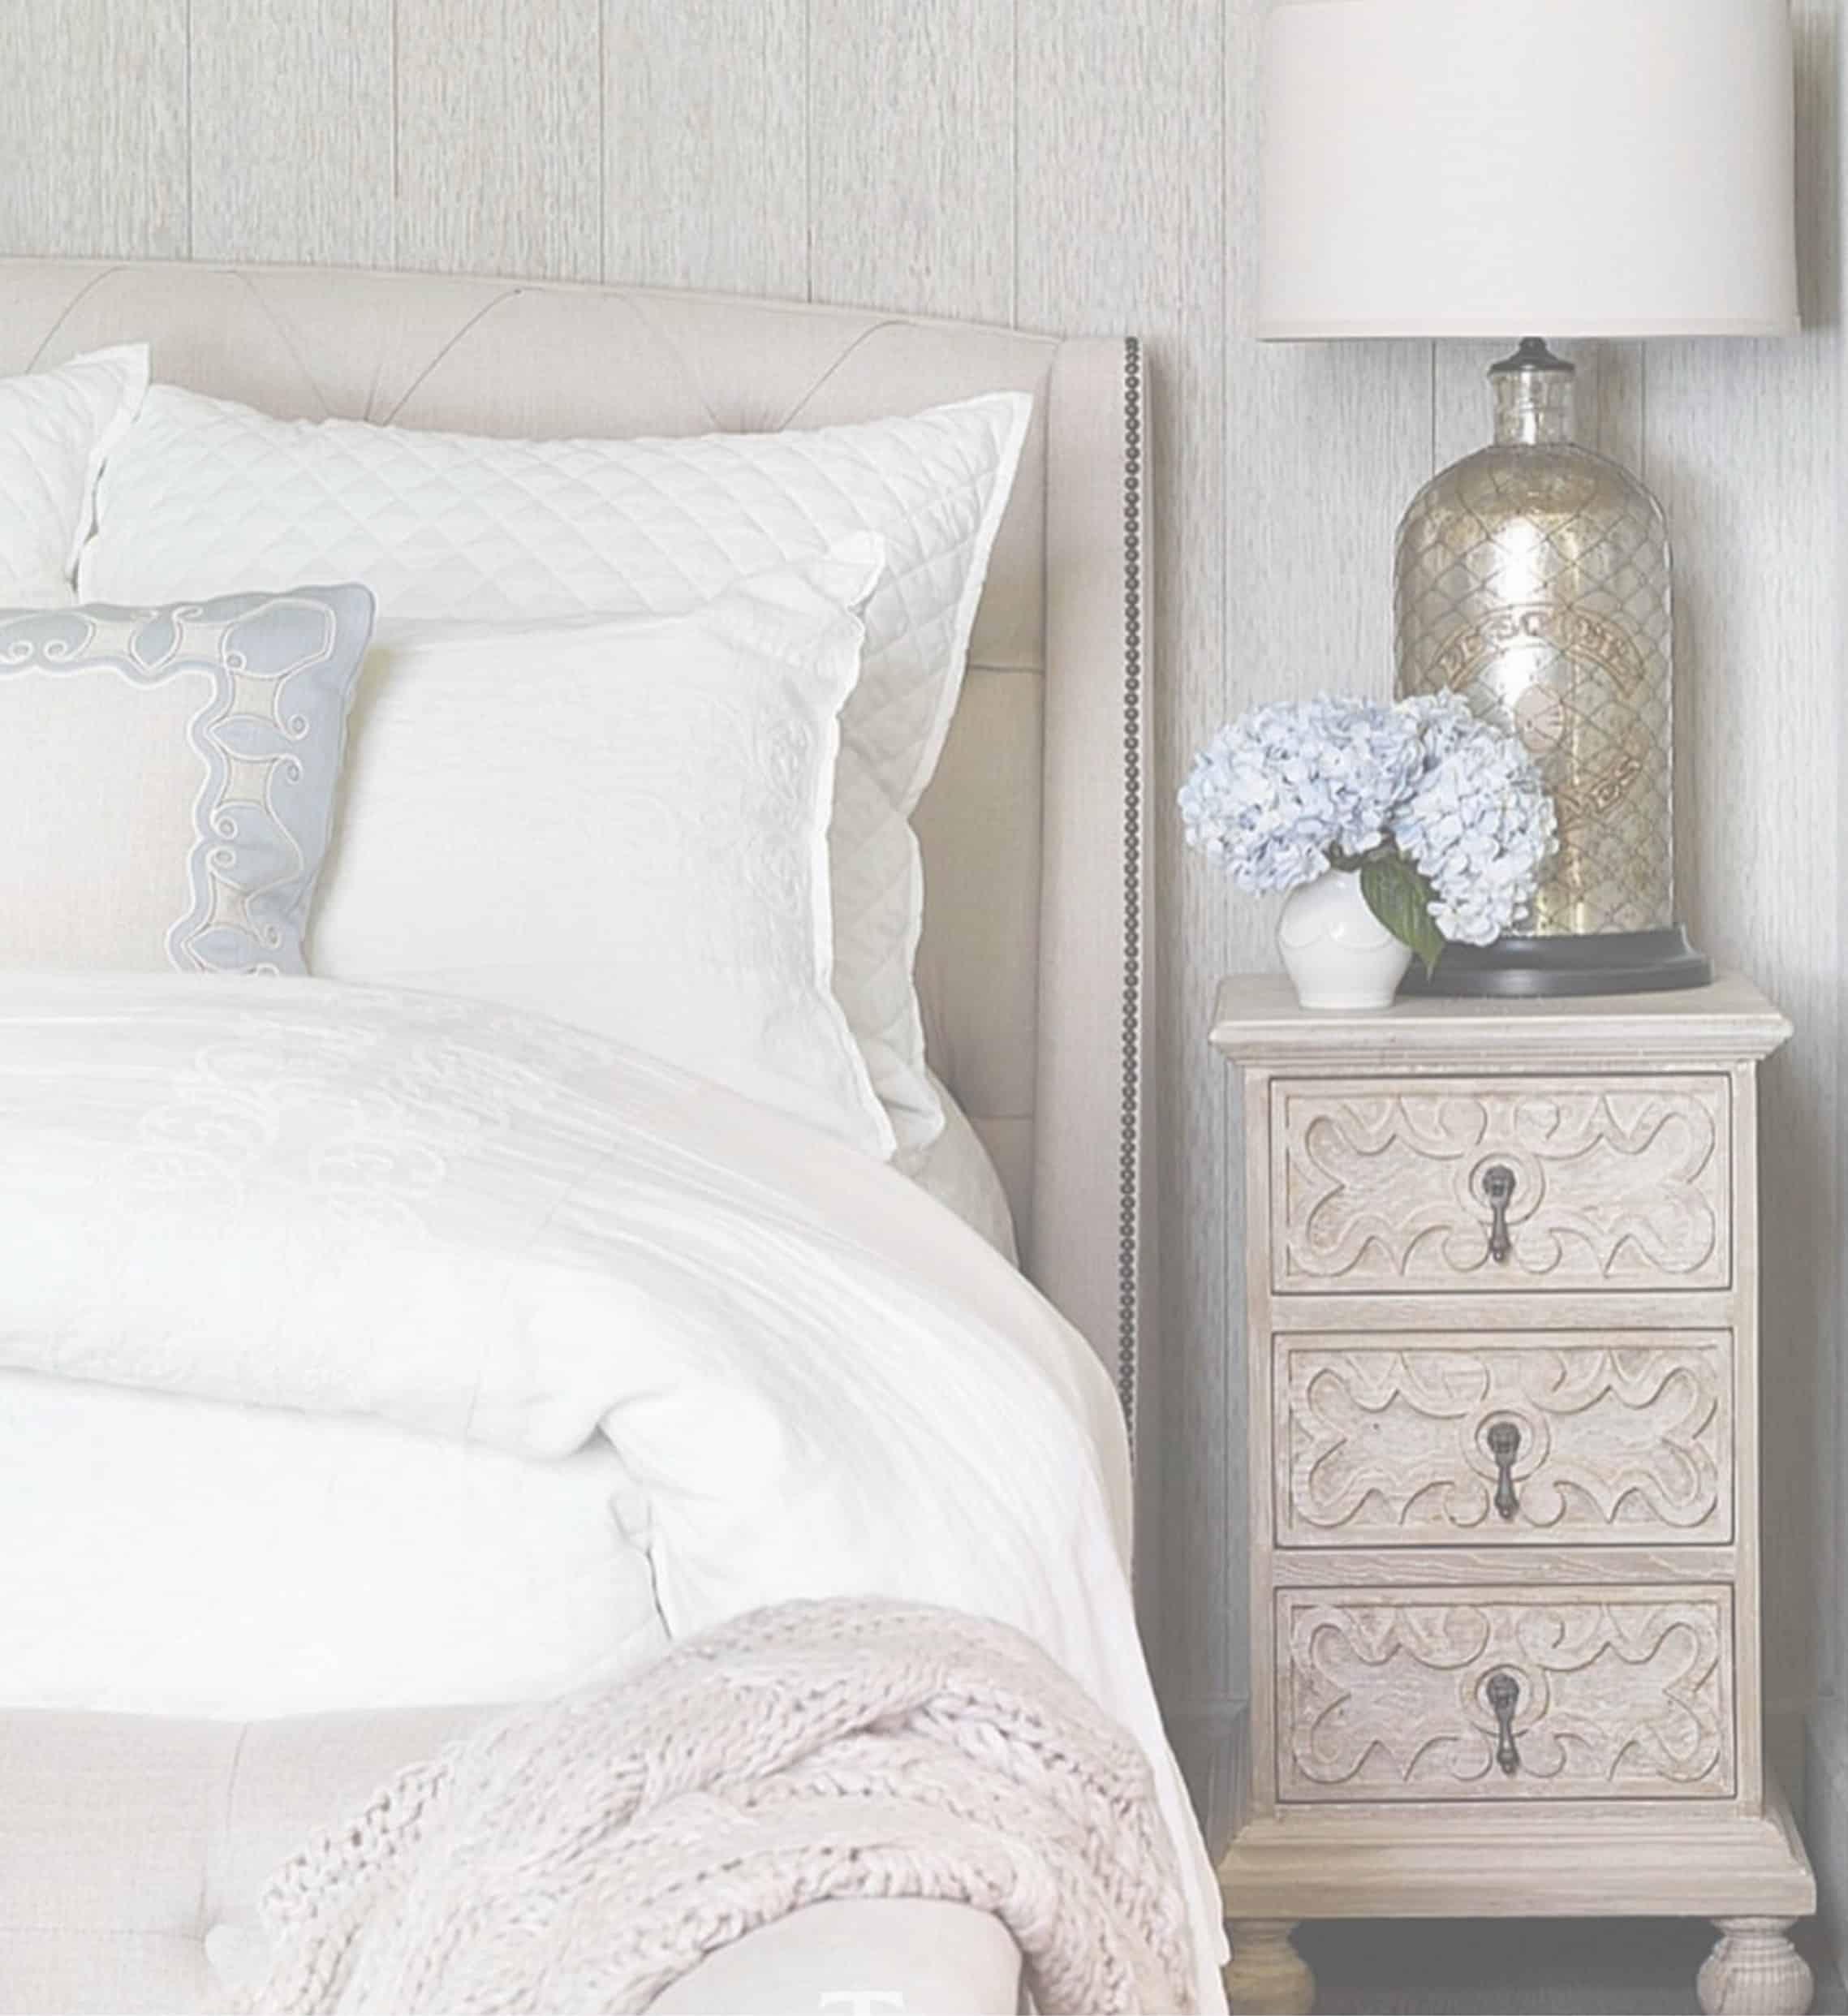 Designer bedroom upholstered headboard bedding white transitional traditional lamp